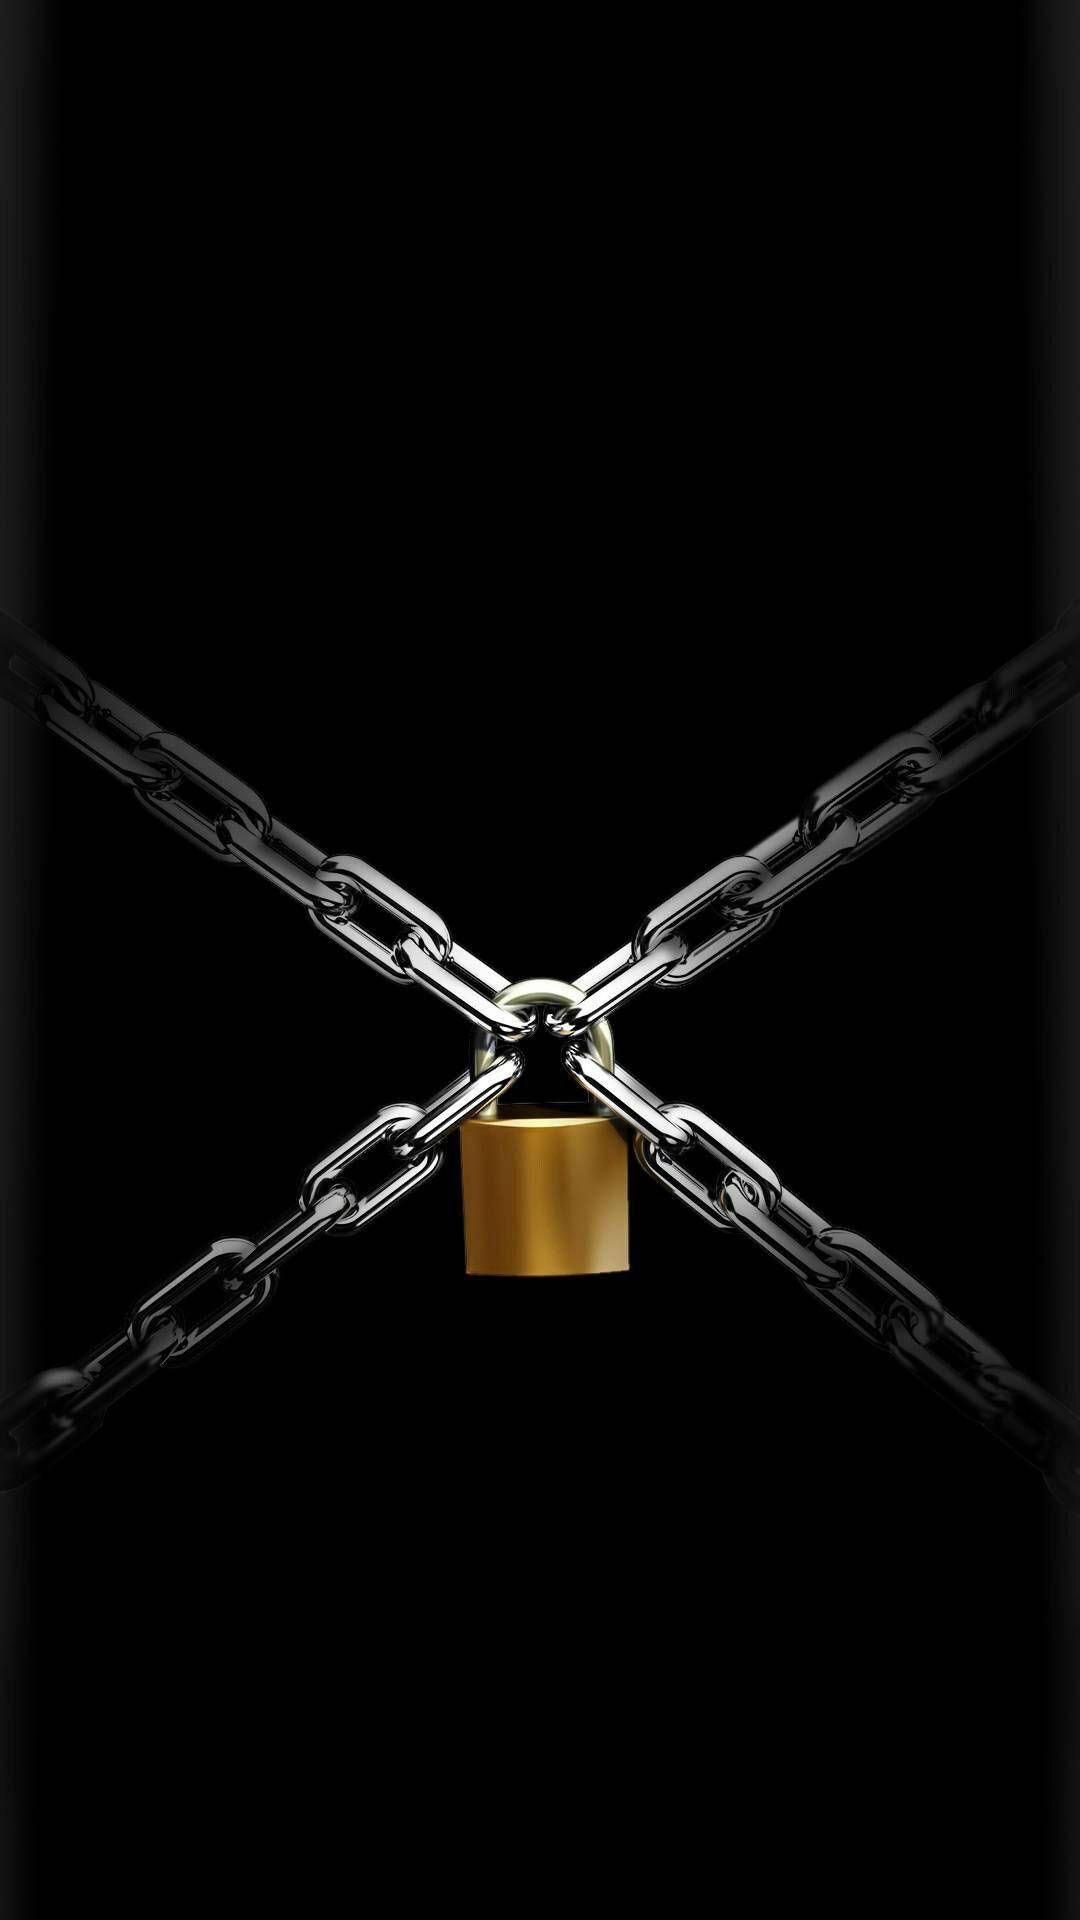 Locked iPhone Wallpaper